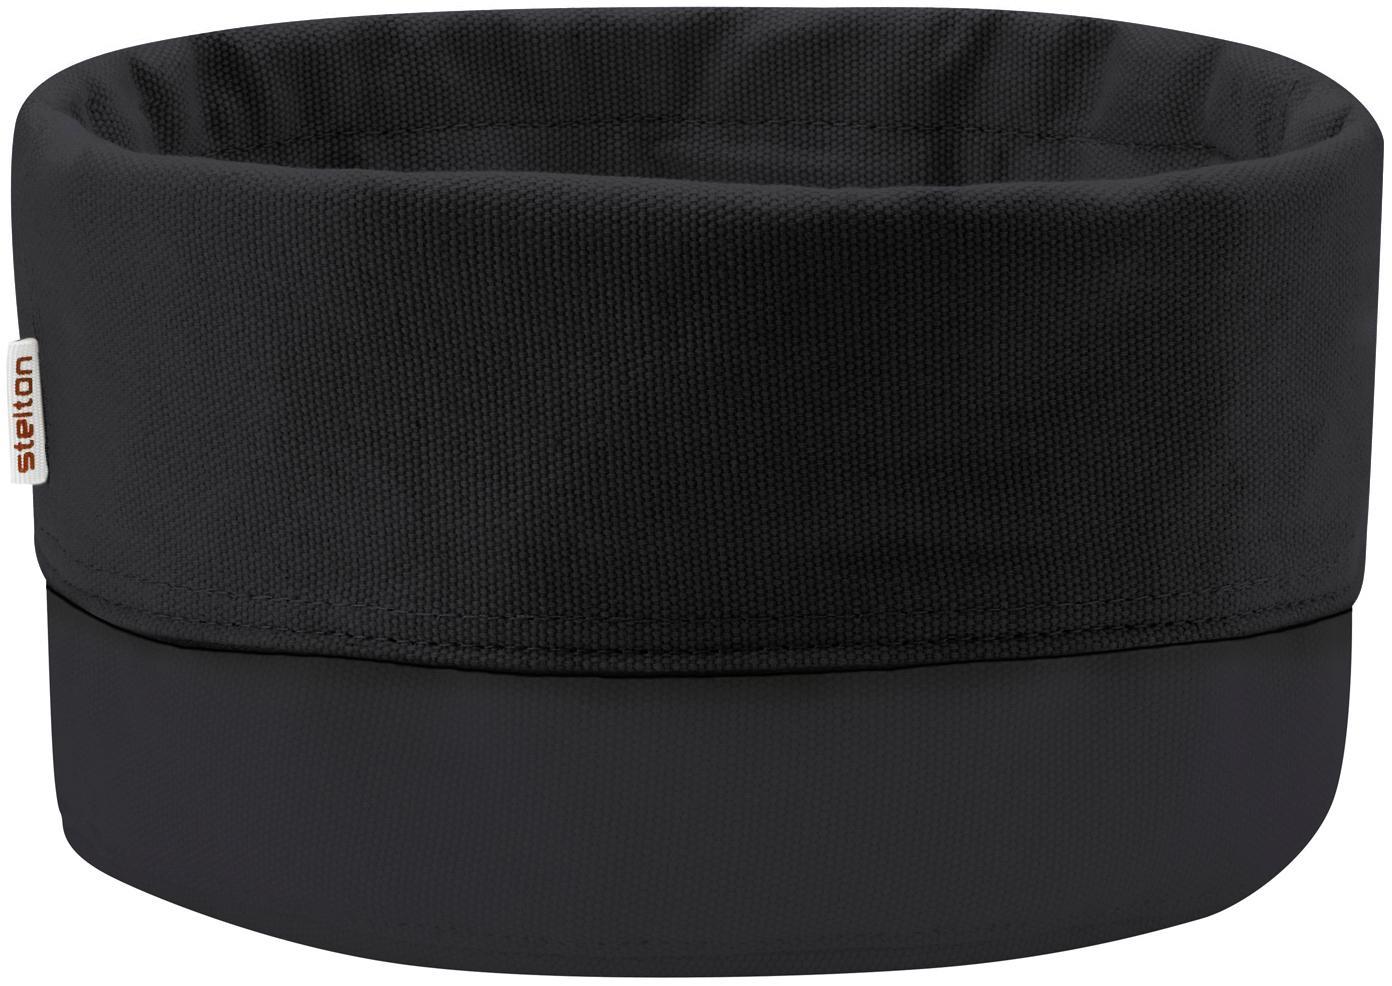 Design broodmand Helga in zwart, Katoen, Zwart, Ø 23 cm